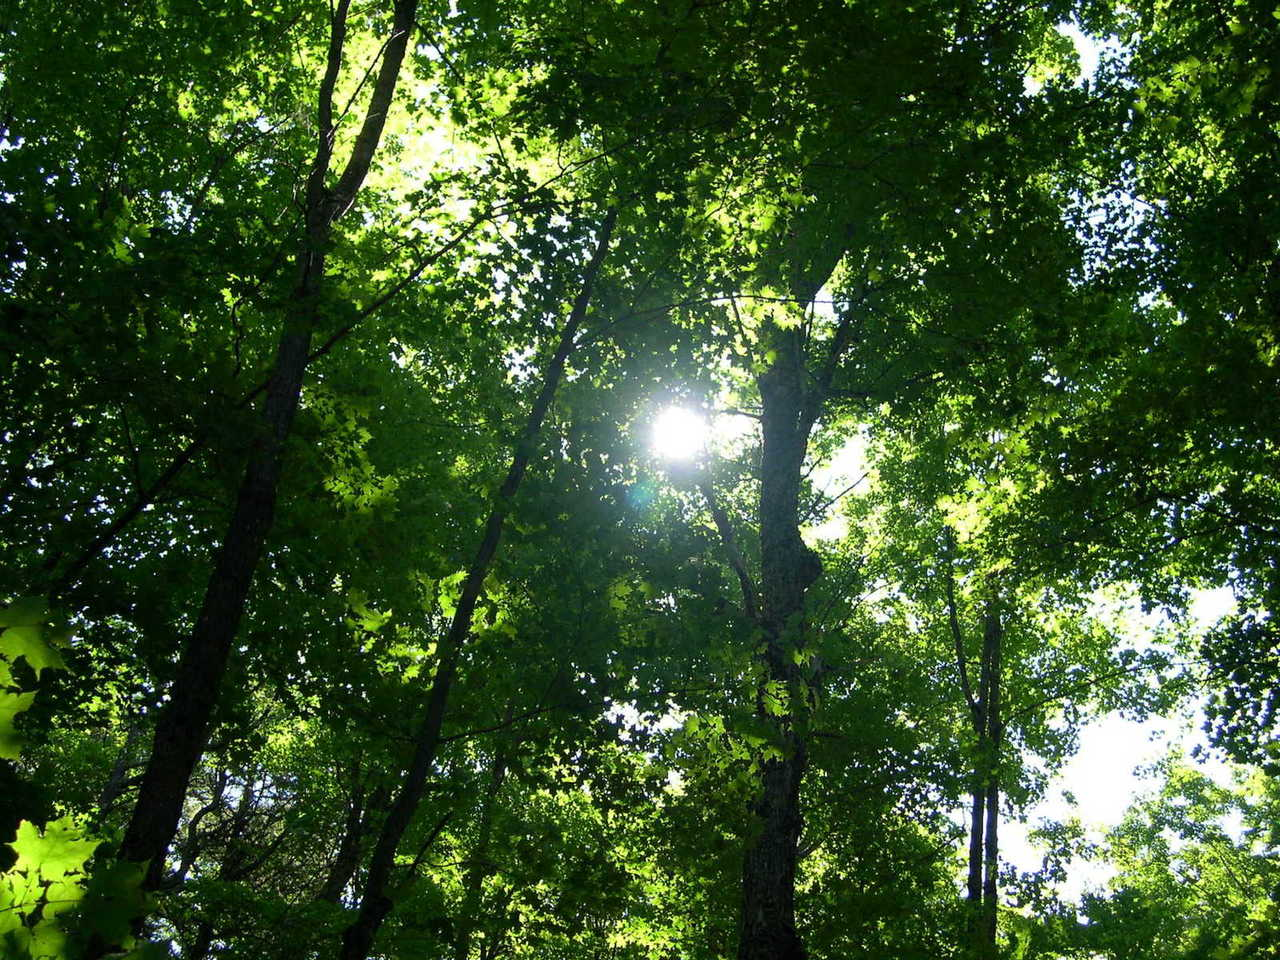 forest-1471223-1280x960.jpg